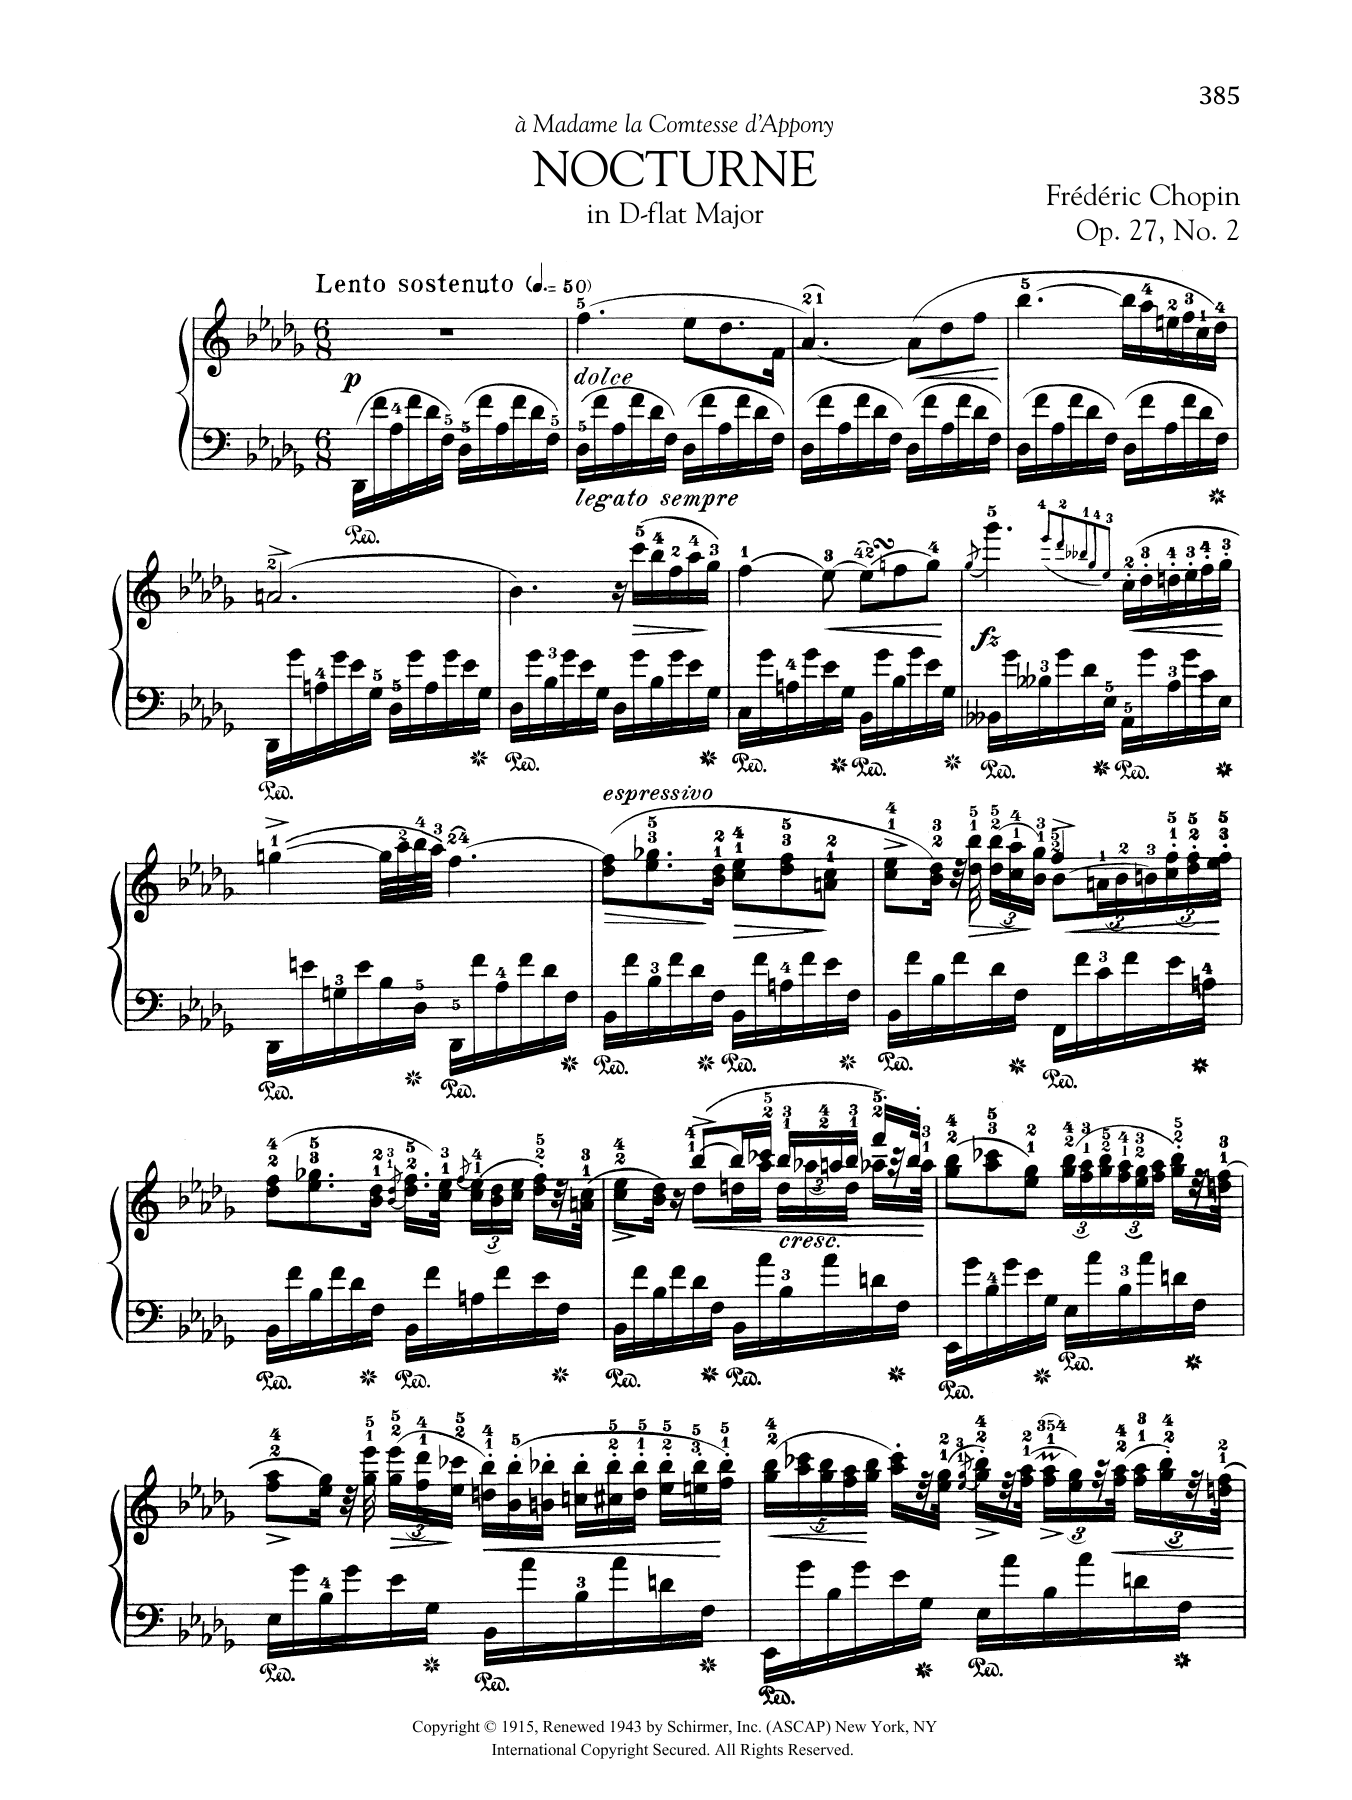 Nocturne in D-flat Major, Op. 27, No. 2 Sheet Music